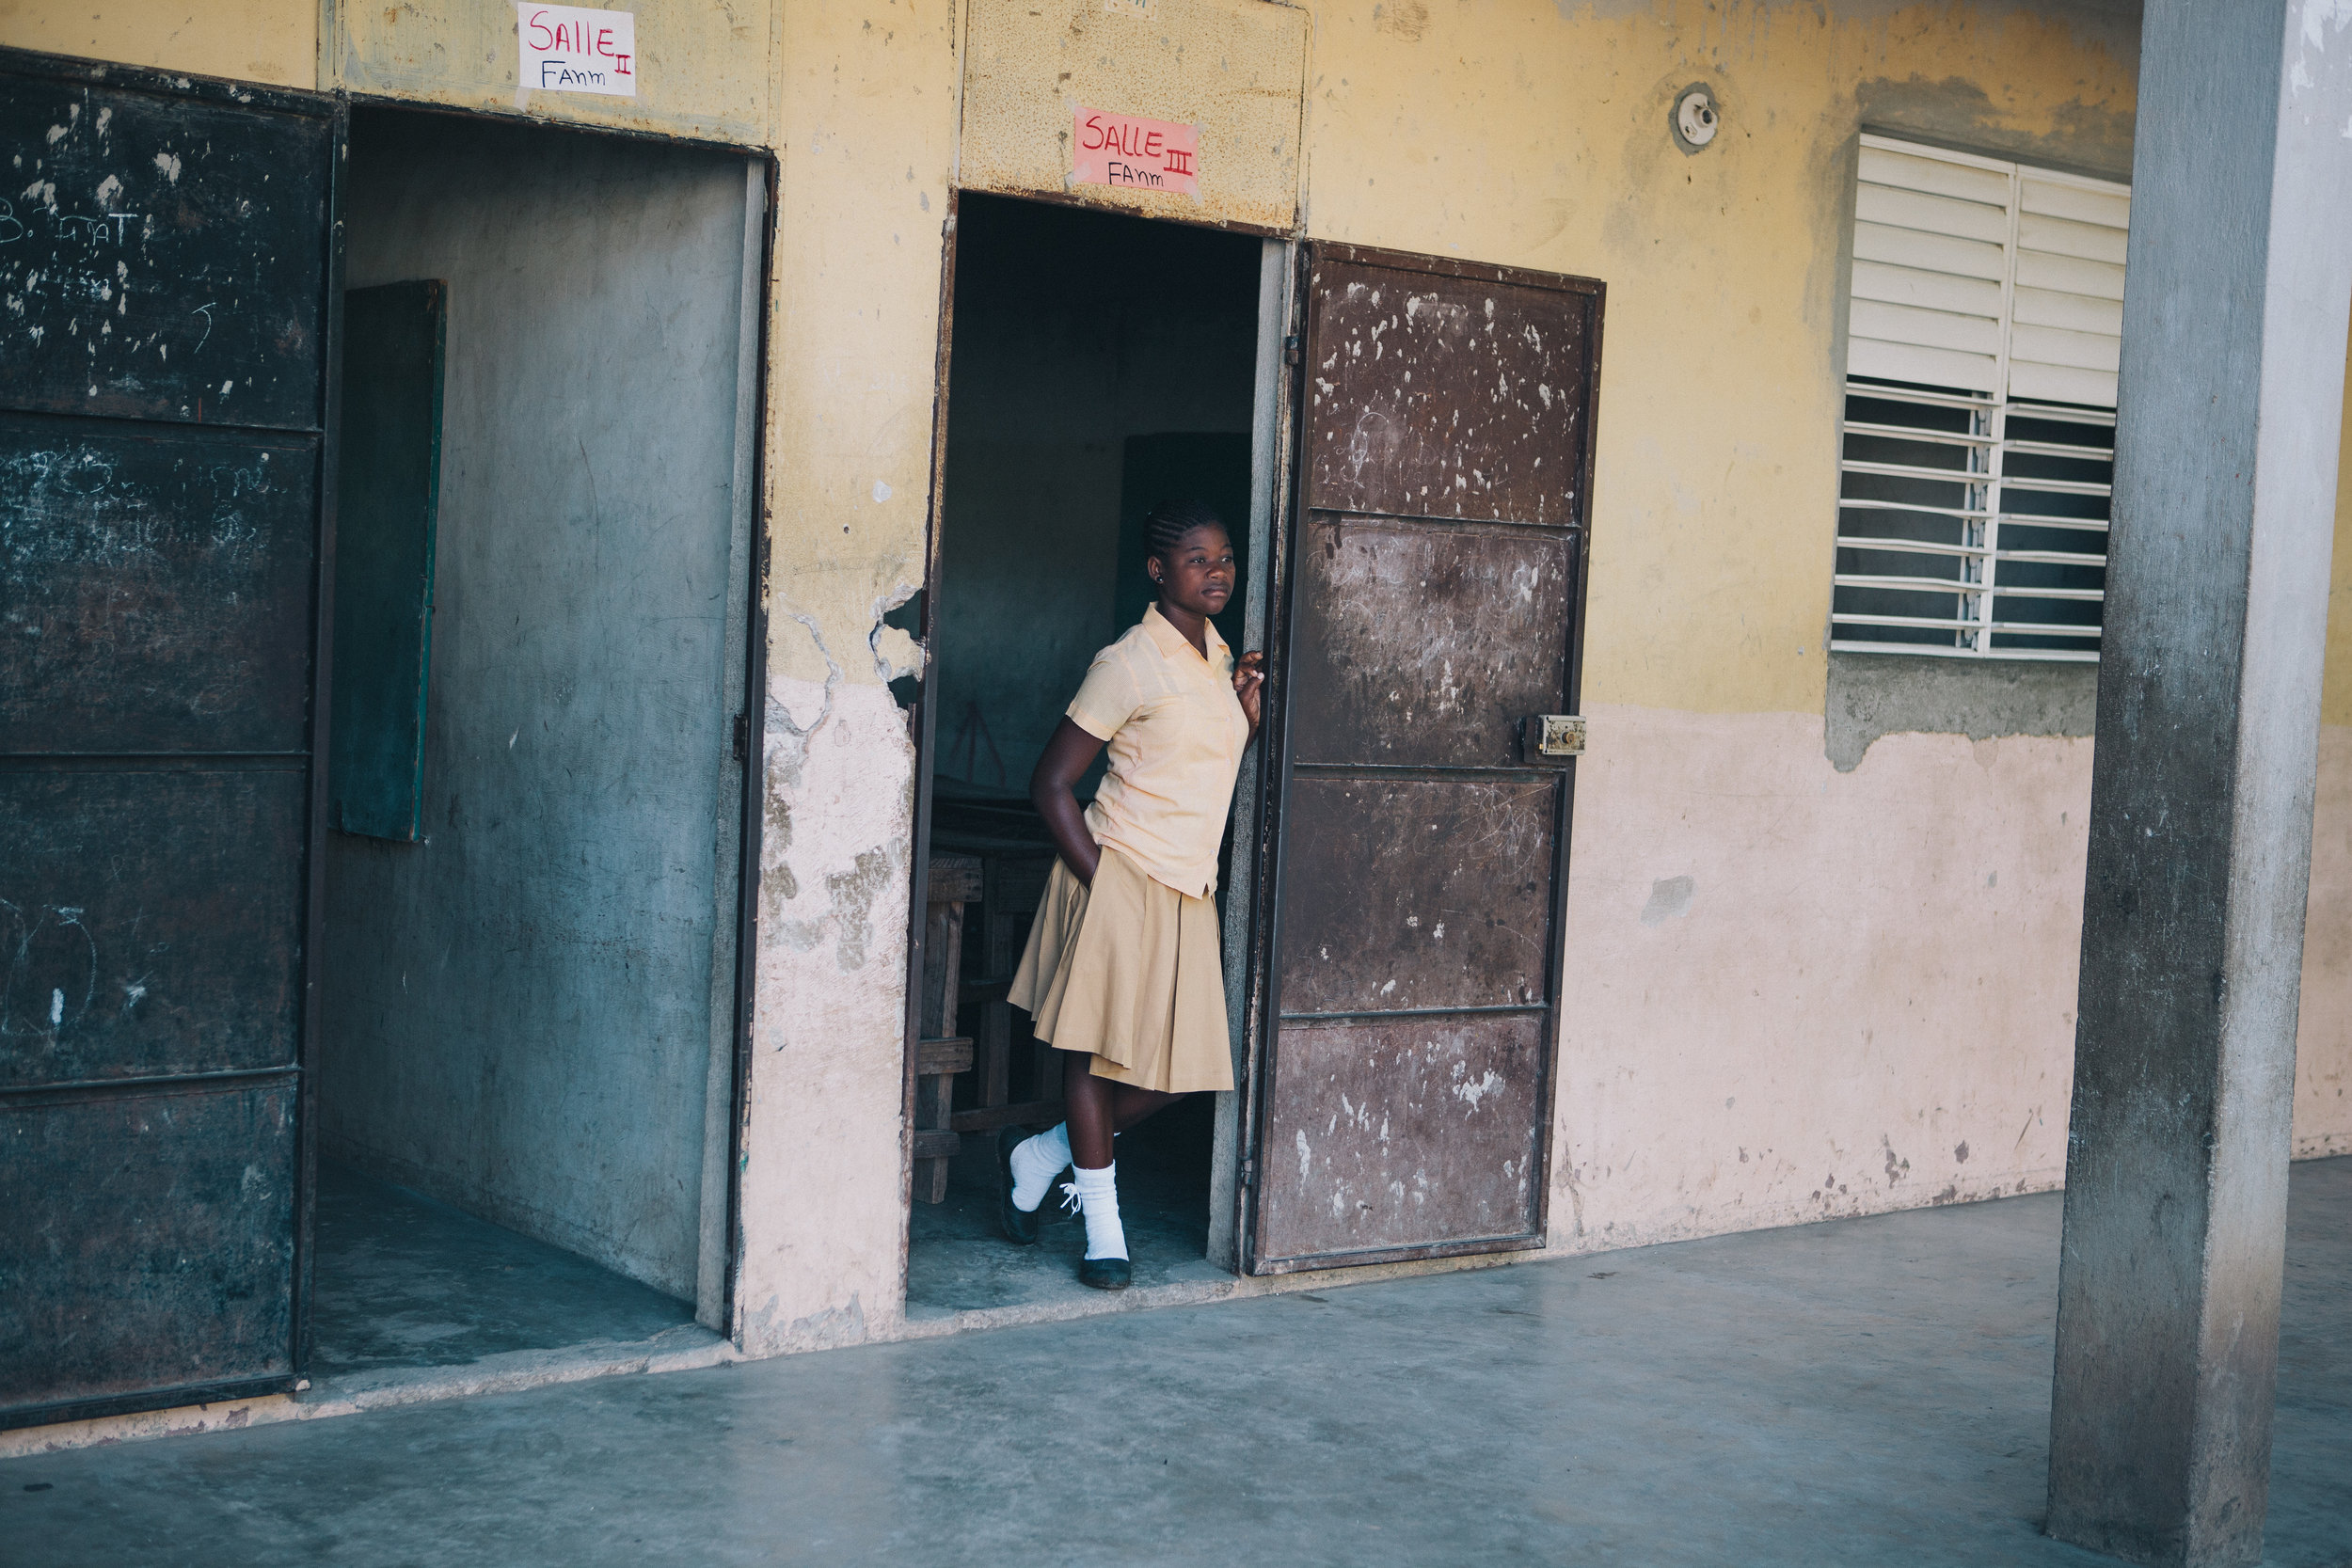 Haiti_Street_Scenes_016.jpg